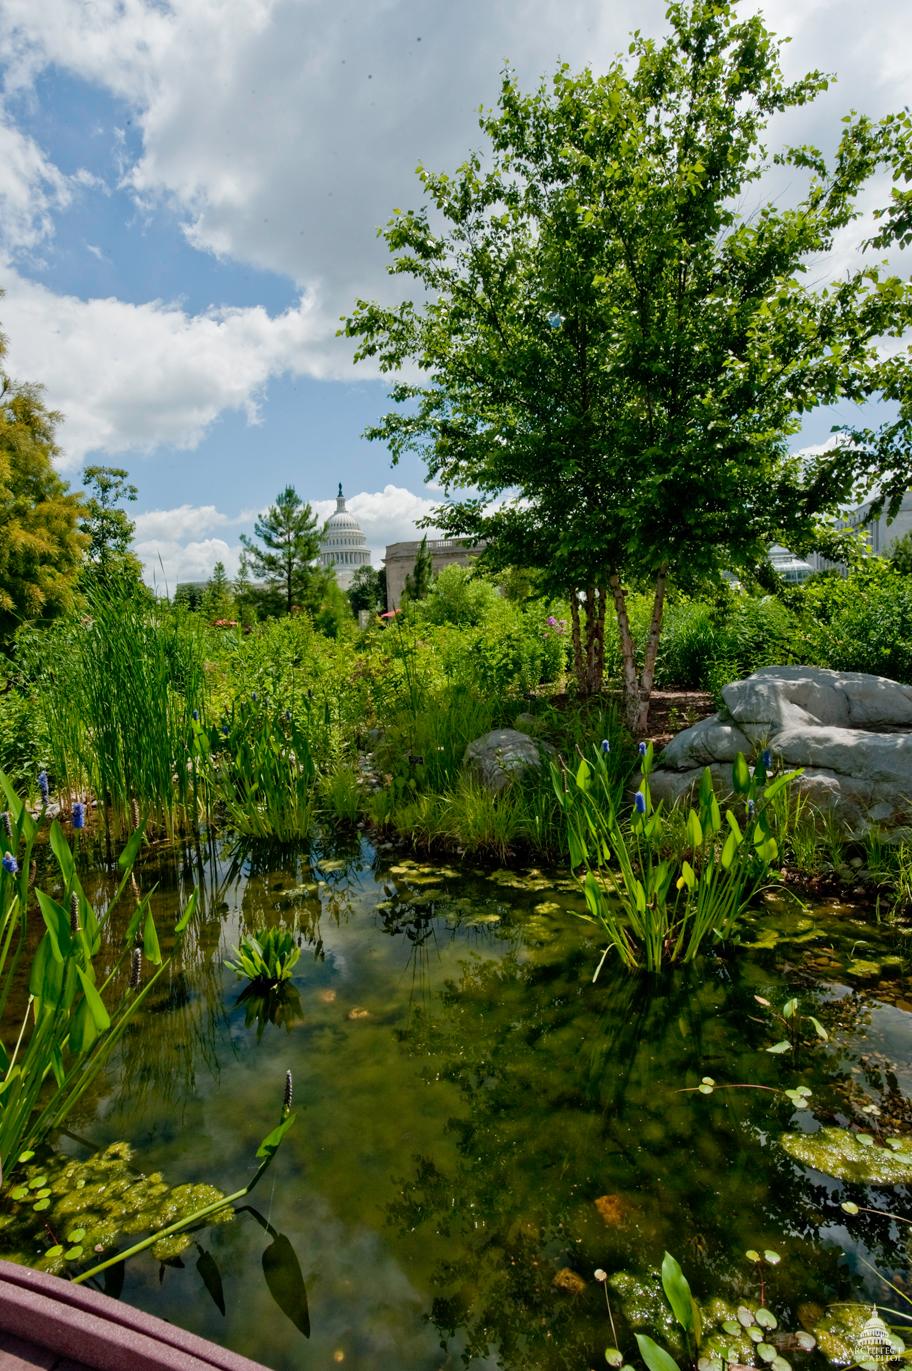 The National Garden at the U.S. Botanic Garden